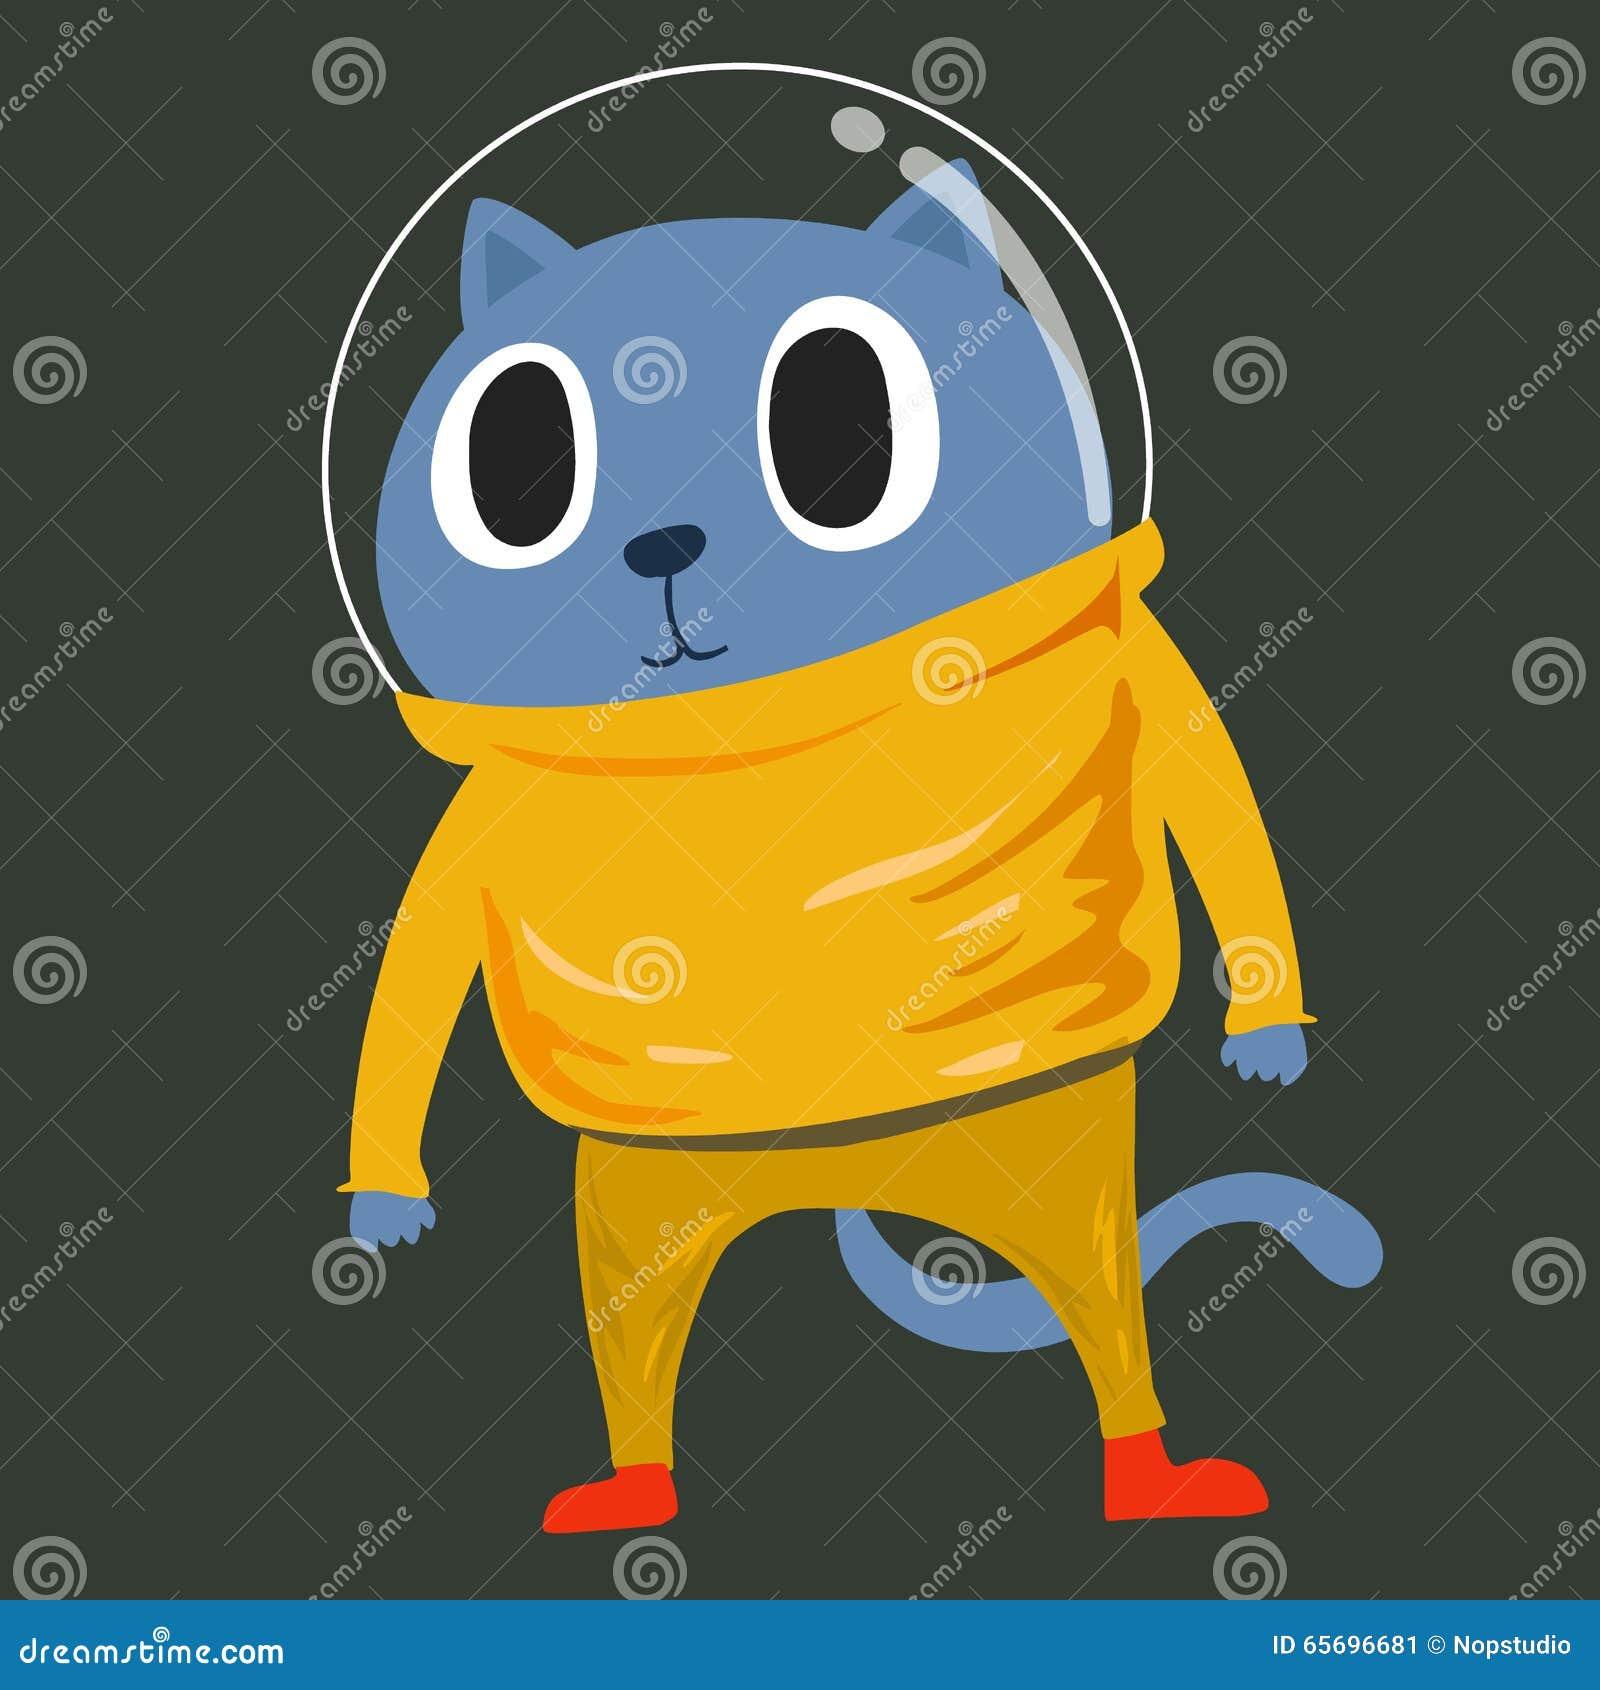 Cat in space suit stock vector. Image of uniform ...